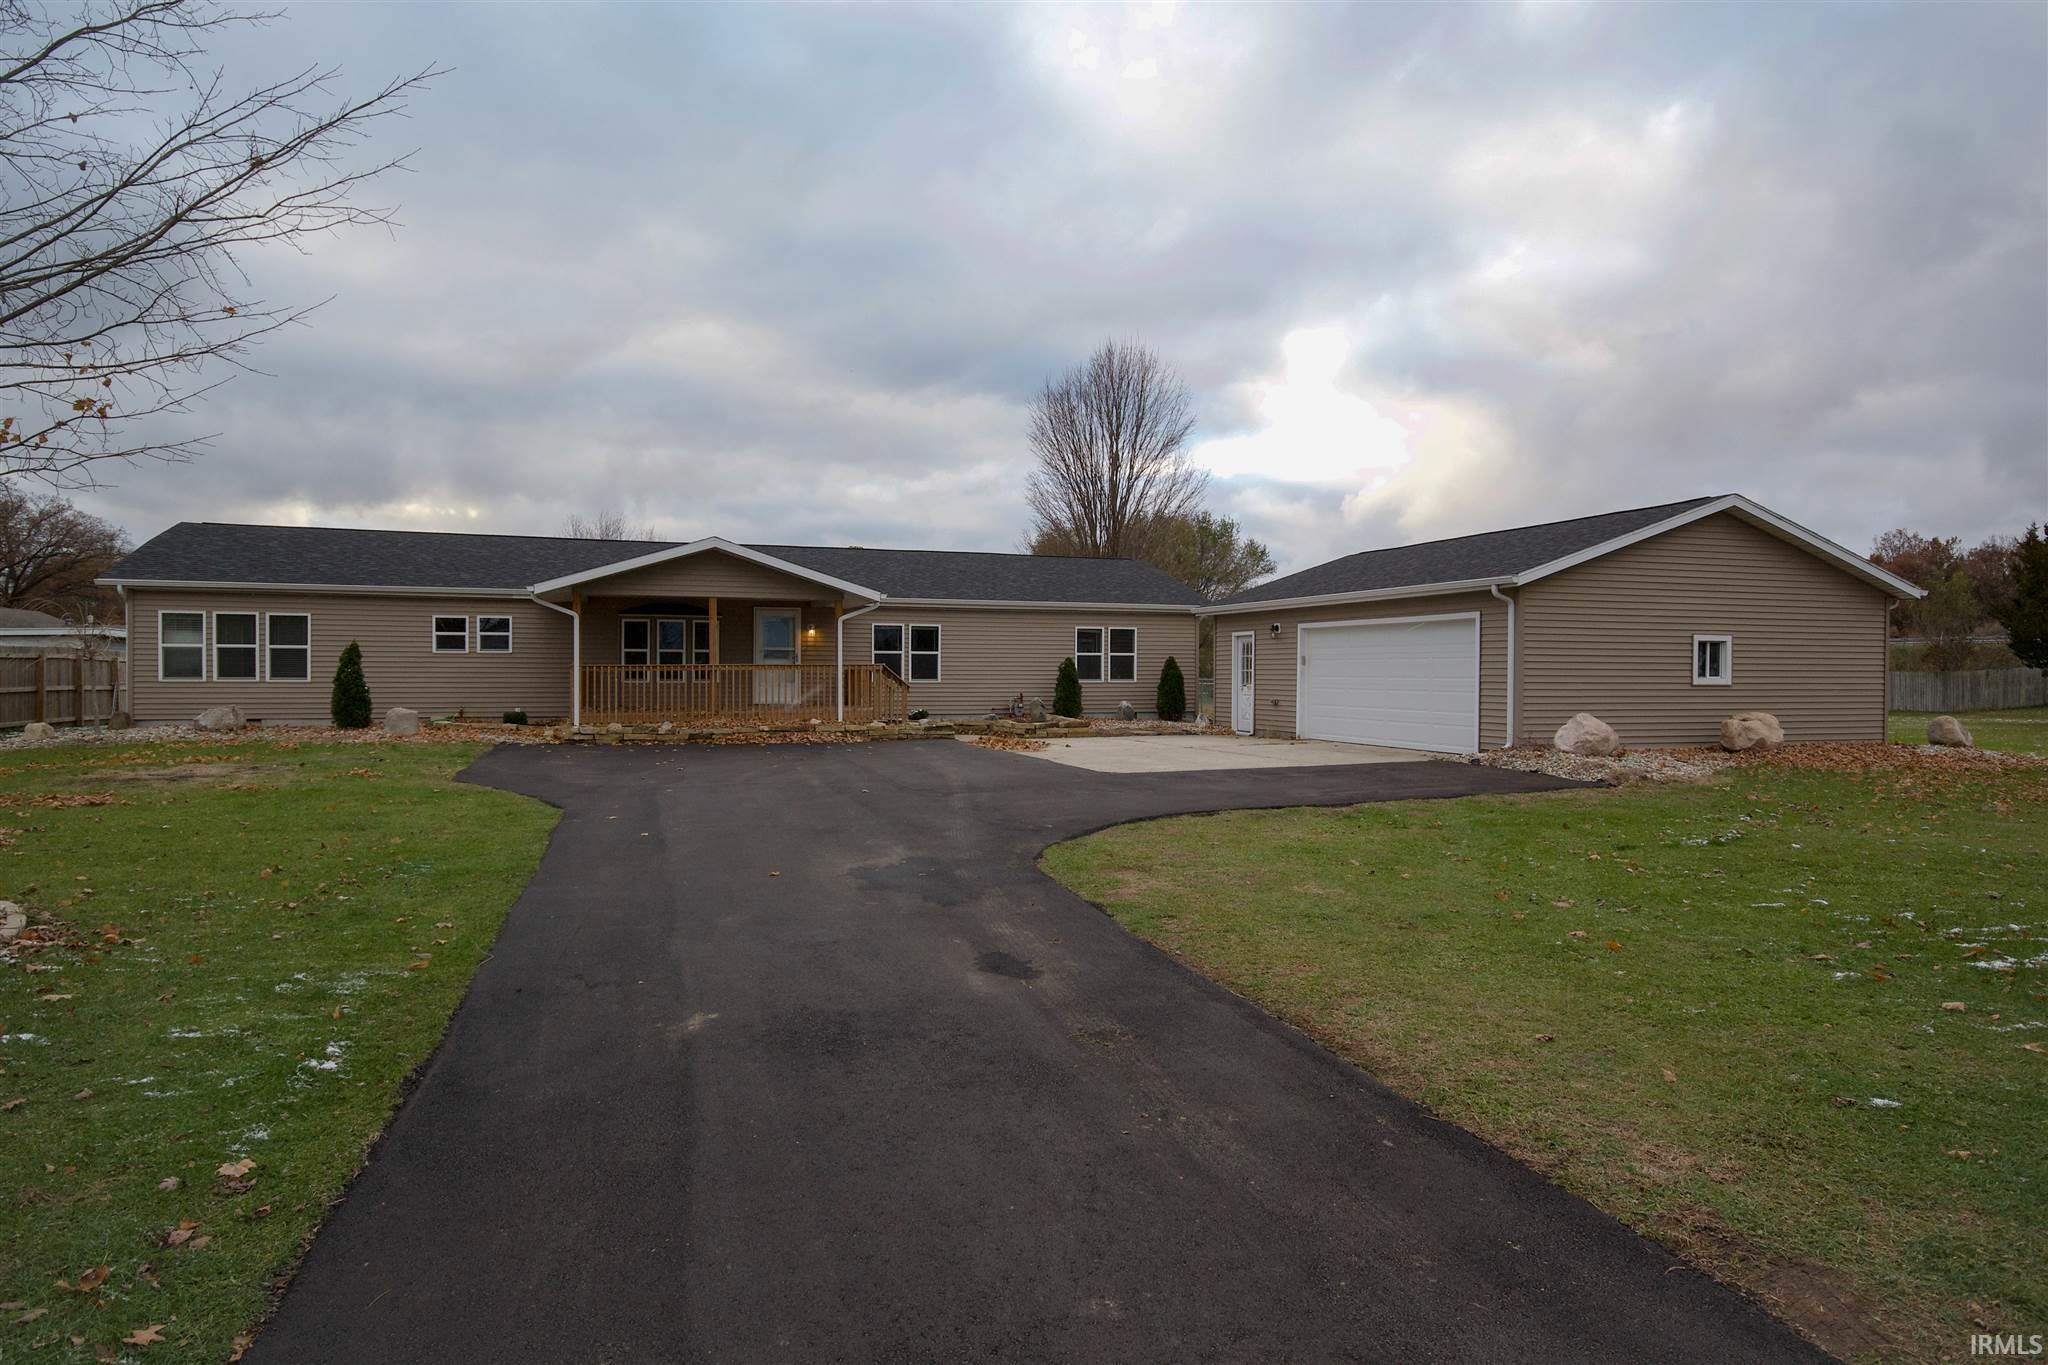 52737 County Road 15 Elkhart, IN 46514